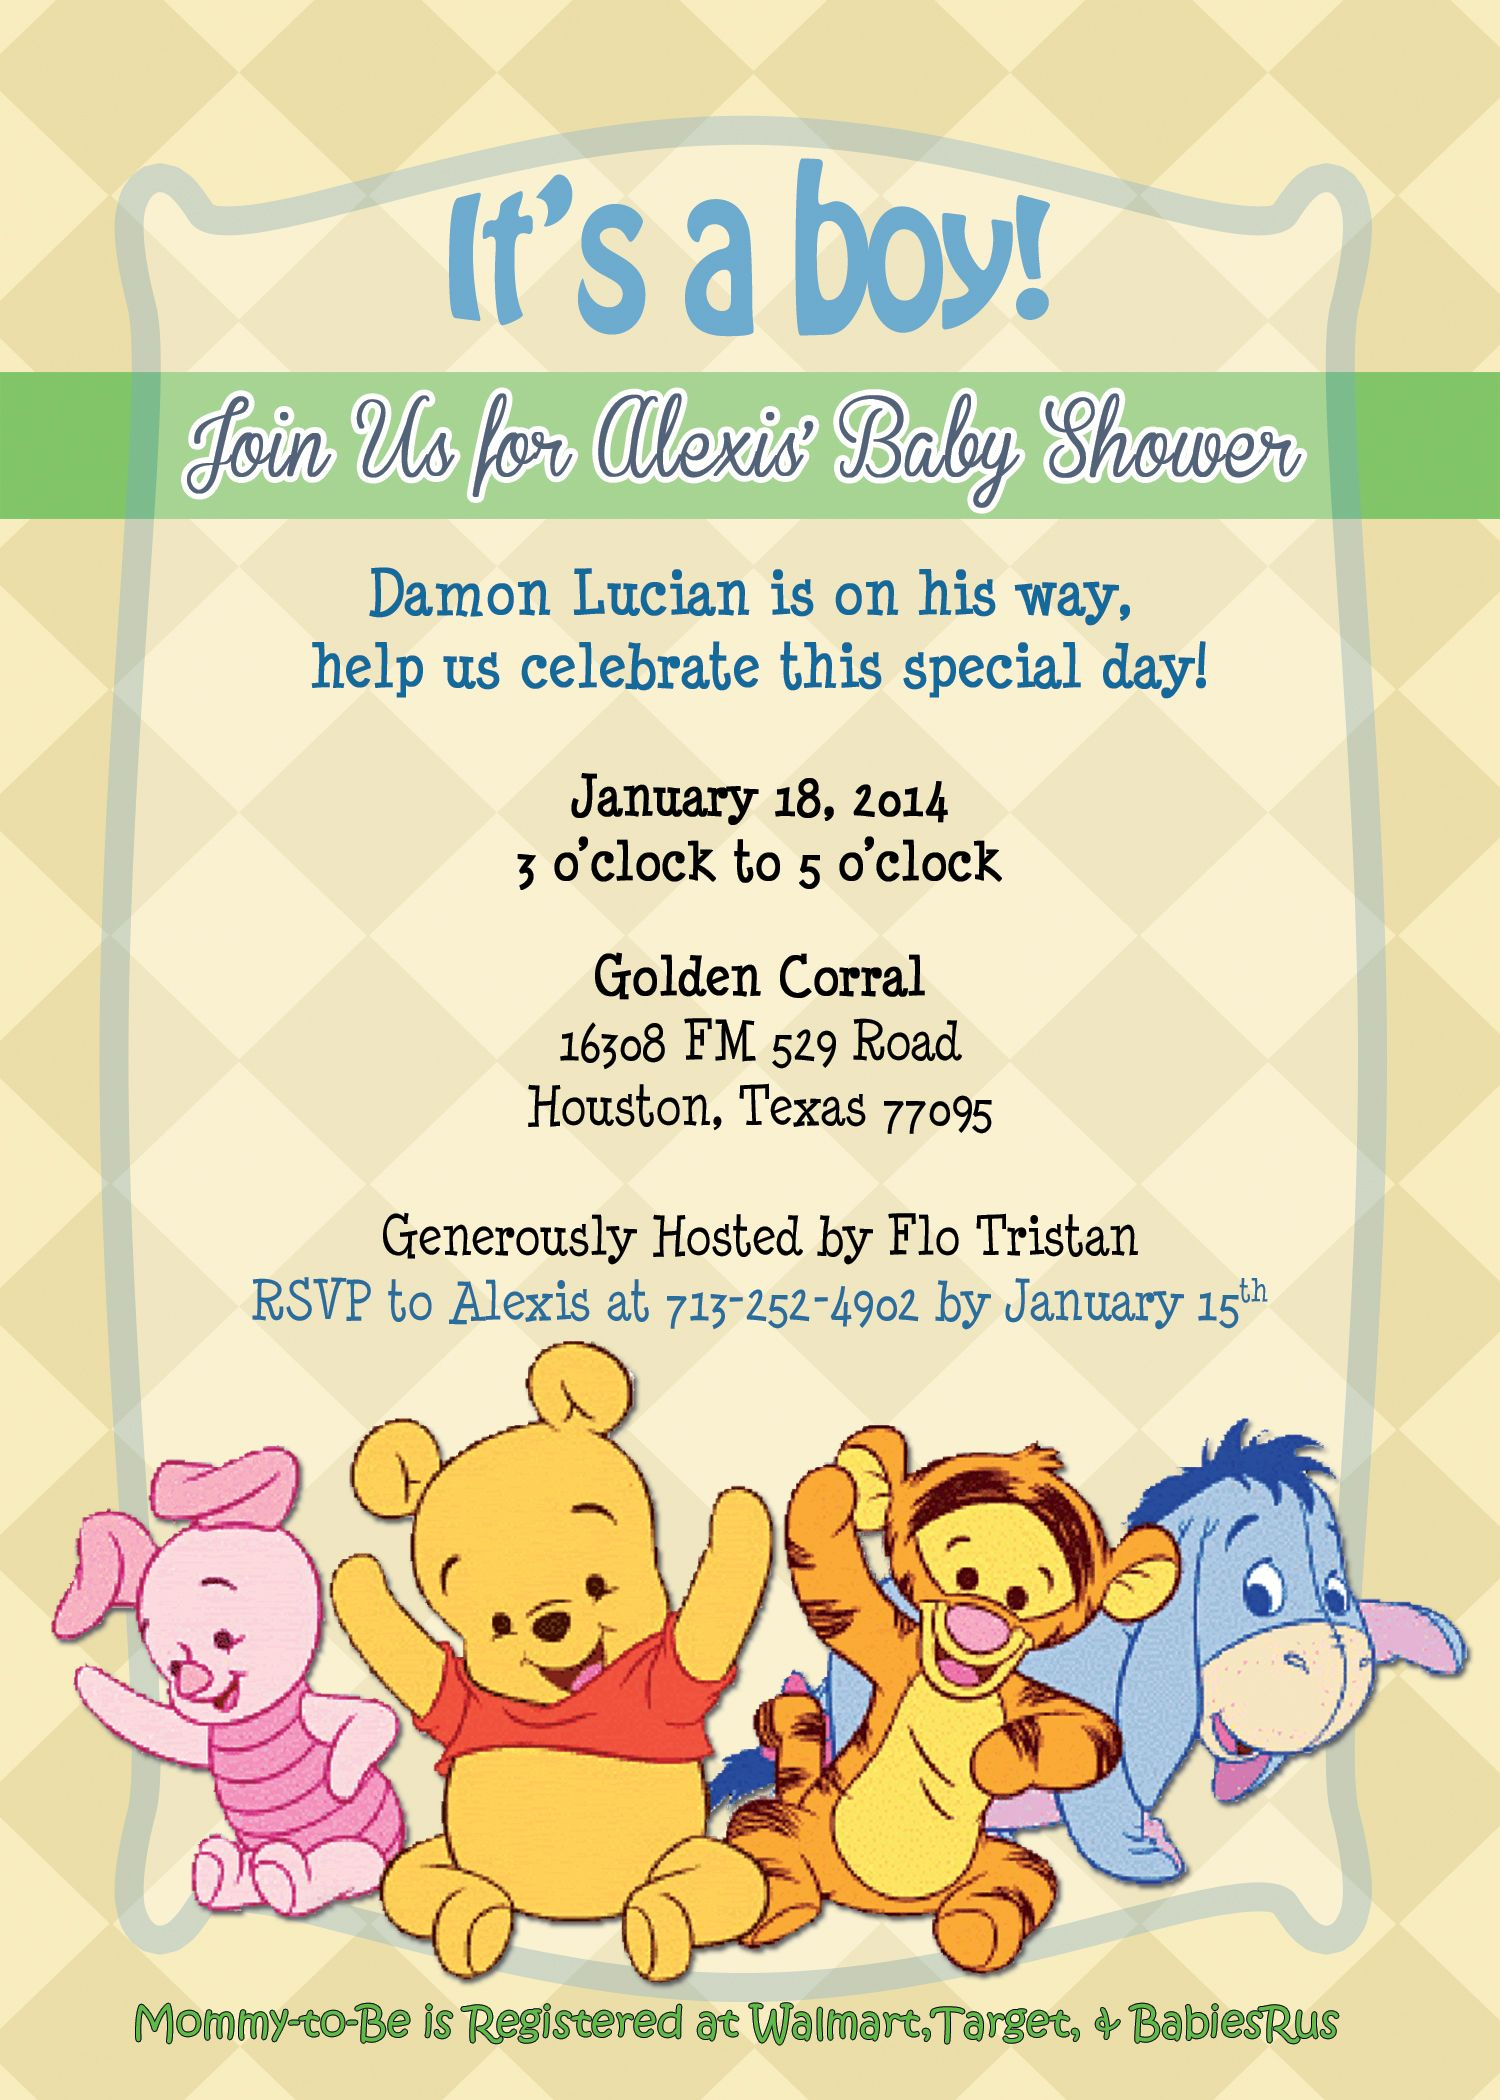 Winnie The Pooh Baby Shower Decorations Walmart : winnie, shower, decorations, walmart, Michelle, Design, Party, Ideas, Invitation, Designs, Invitaciones, Shower,, Shower, Invitations,, Invitations